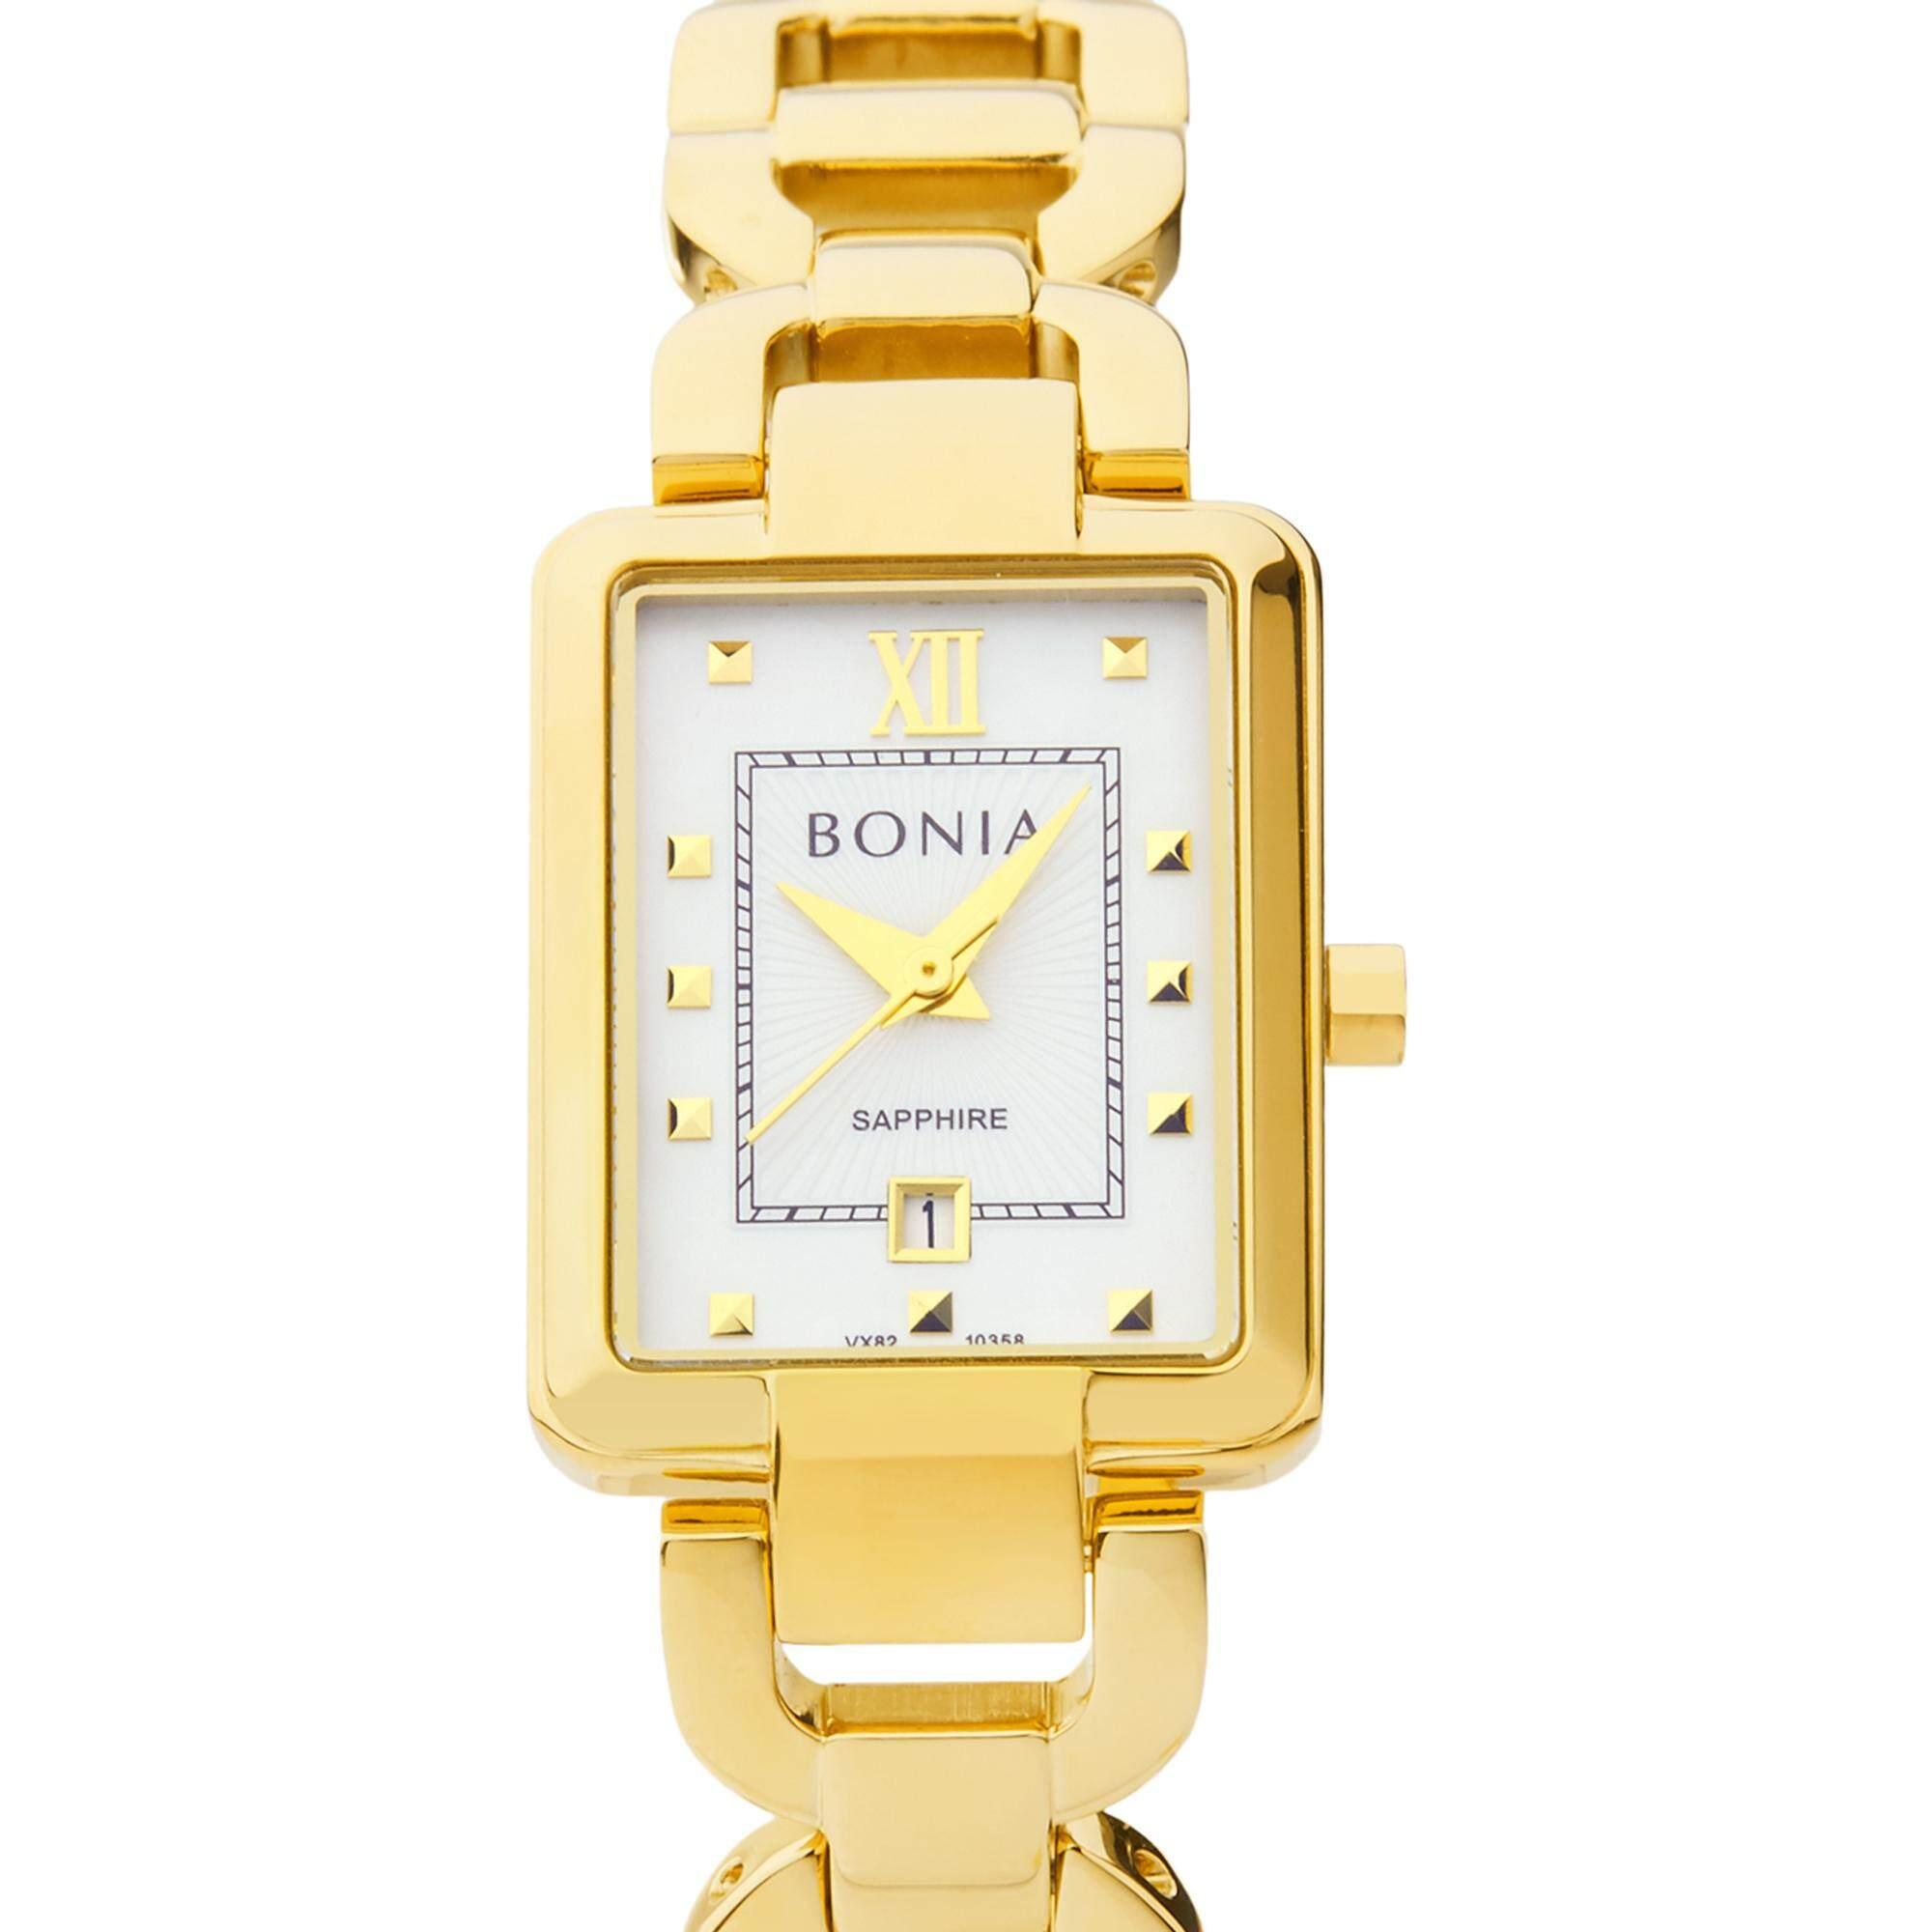 Bonia Buy At Best Price In Malaysia Sepatu Boot Wanita Rc316 Gold Bruna Watch